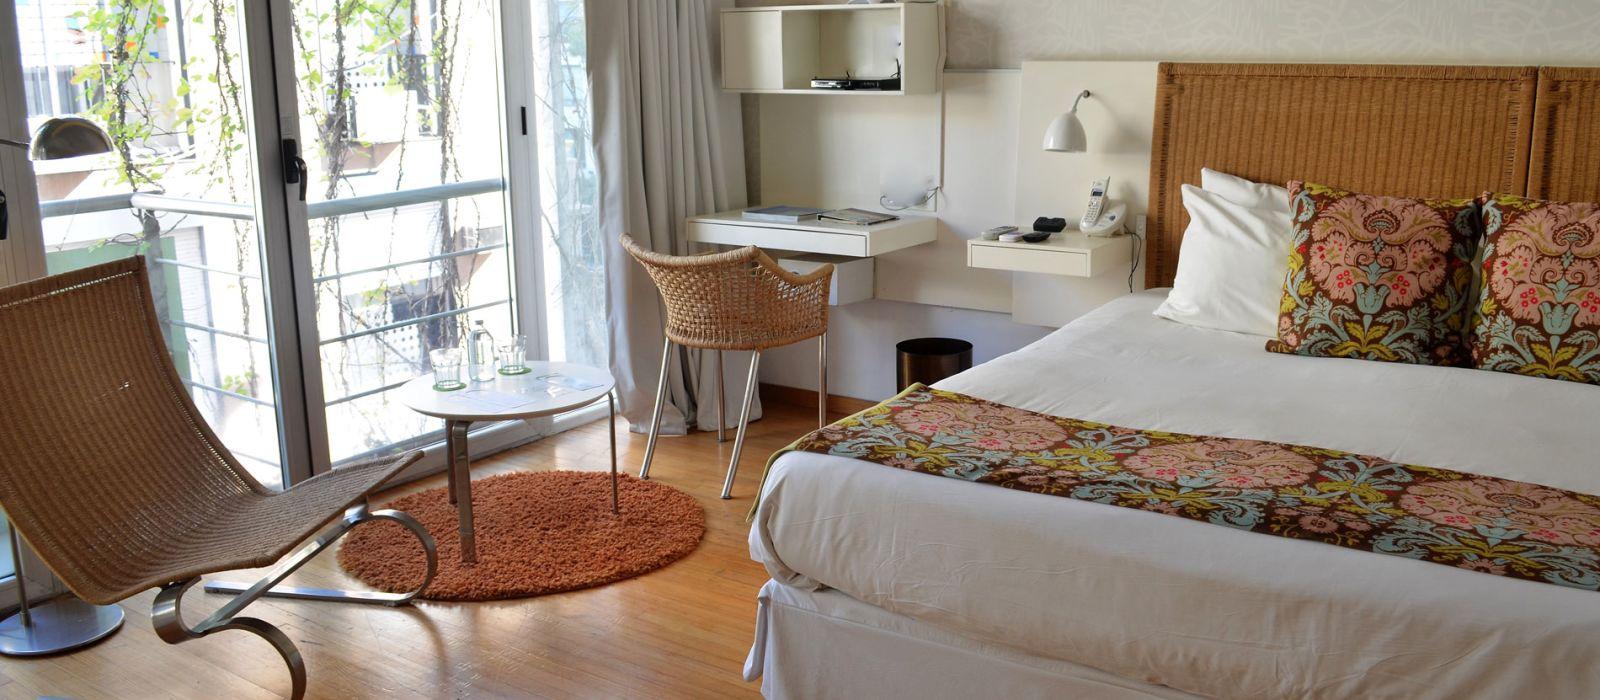 Casa calma hotel in argentina enchanting travels for Casa jardin hostel buenos aires